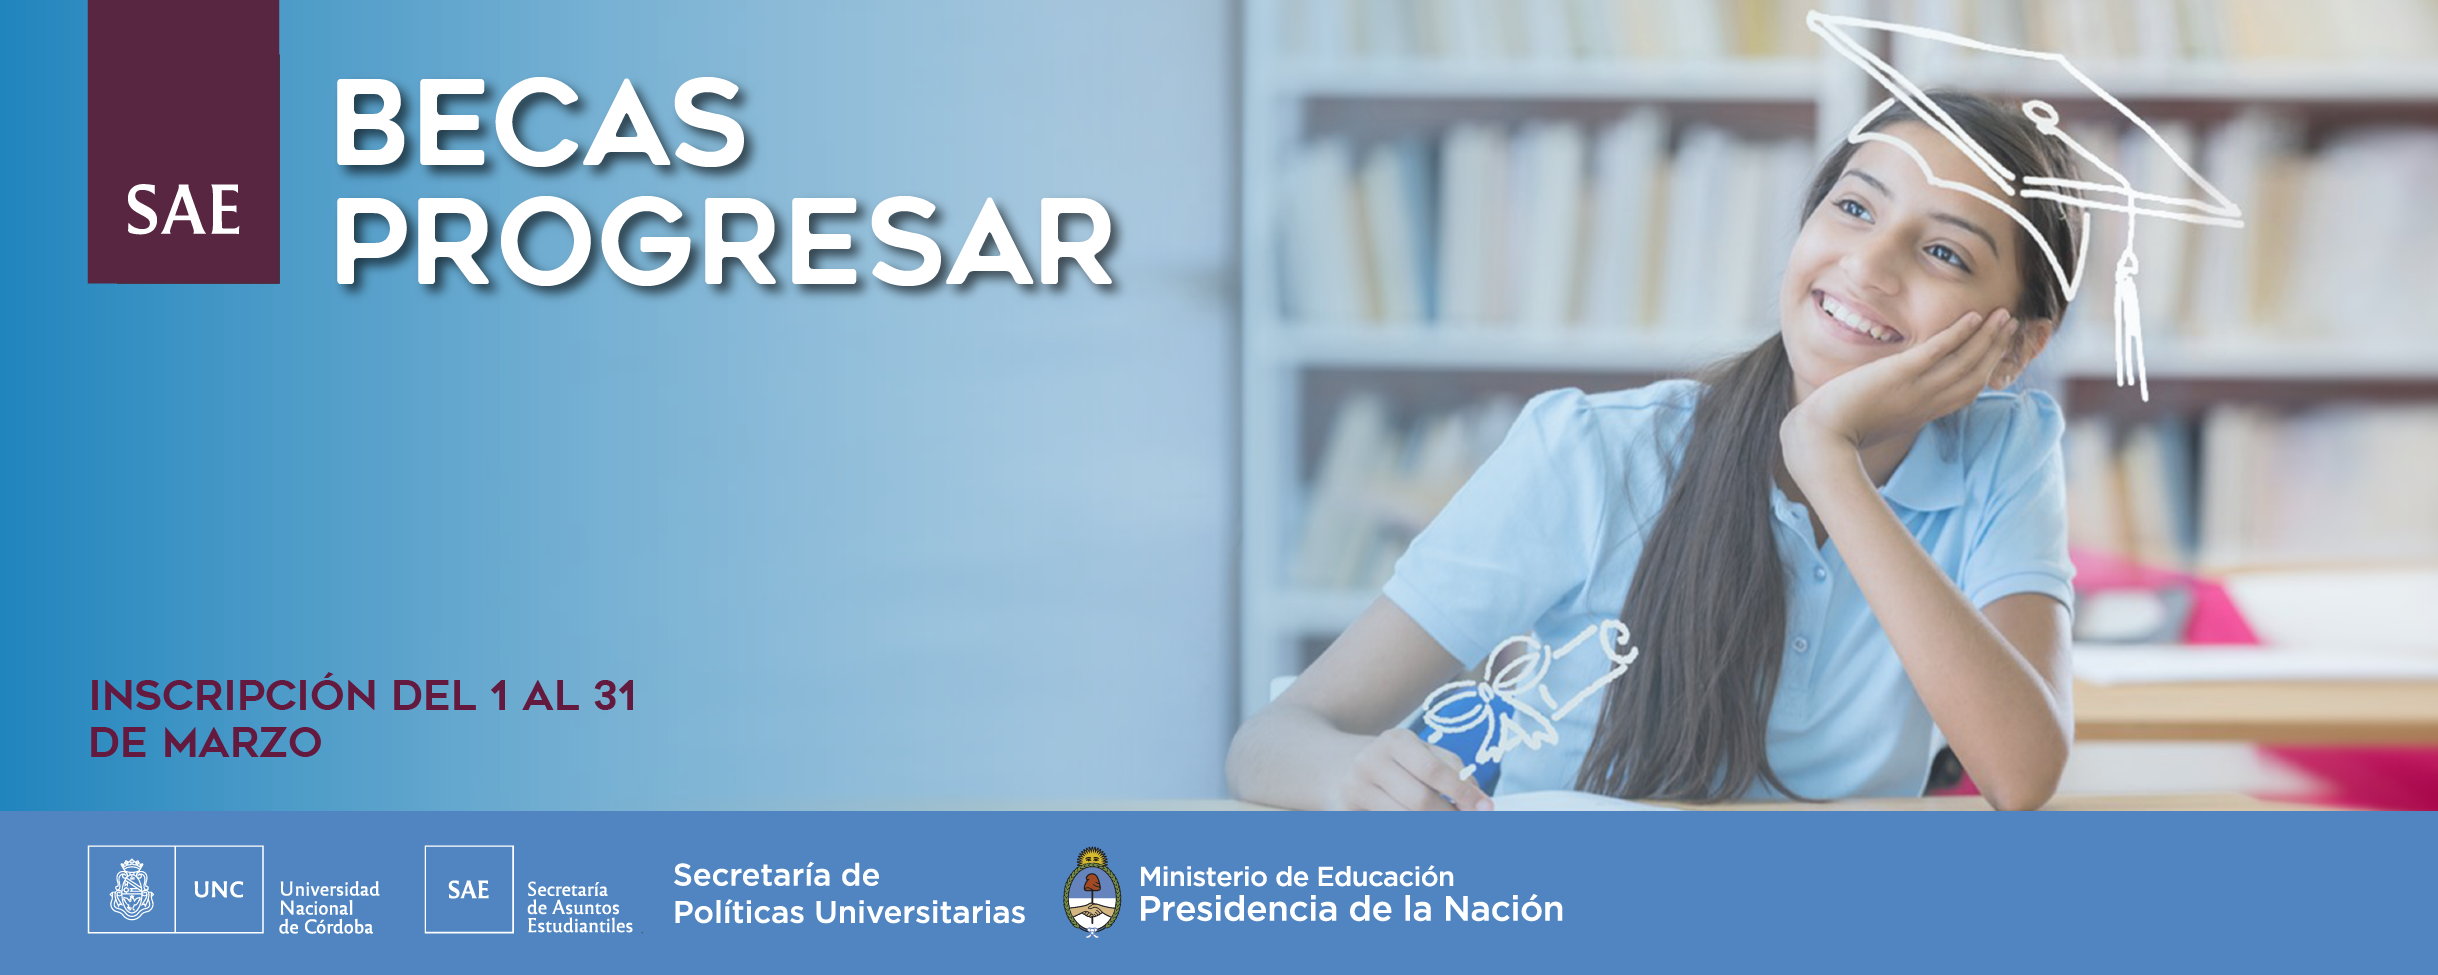 becas progresar_2019-01